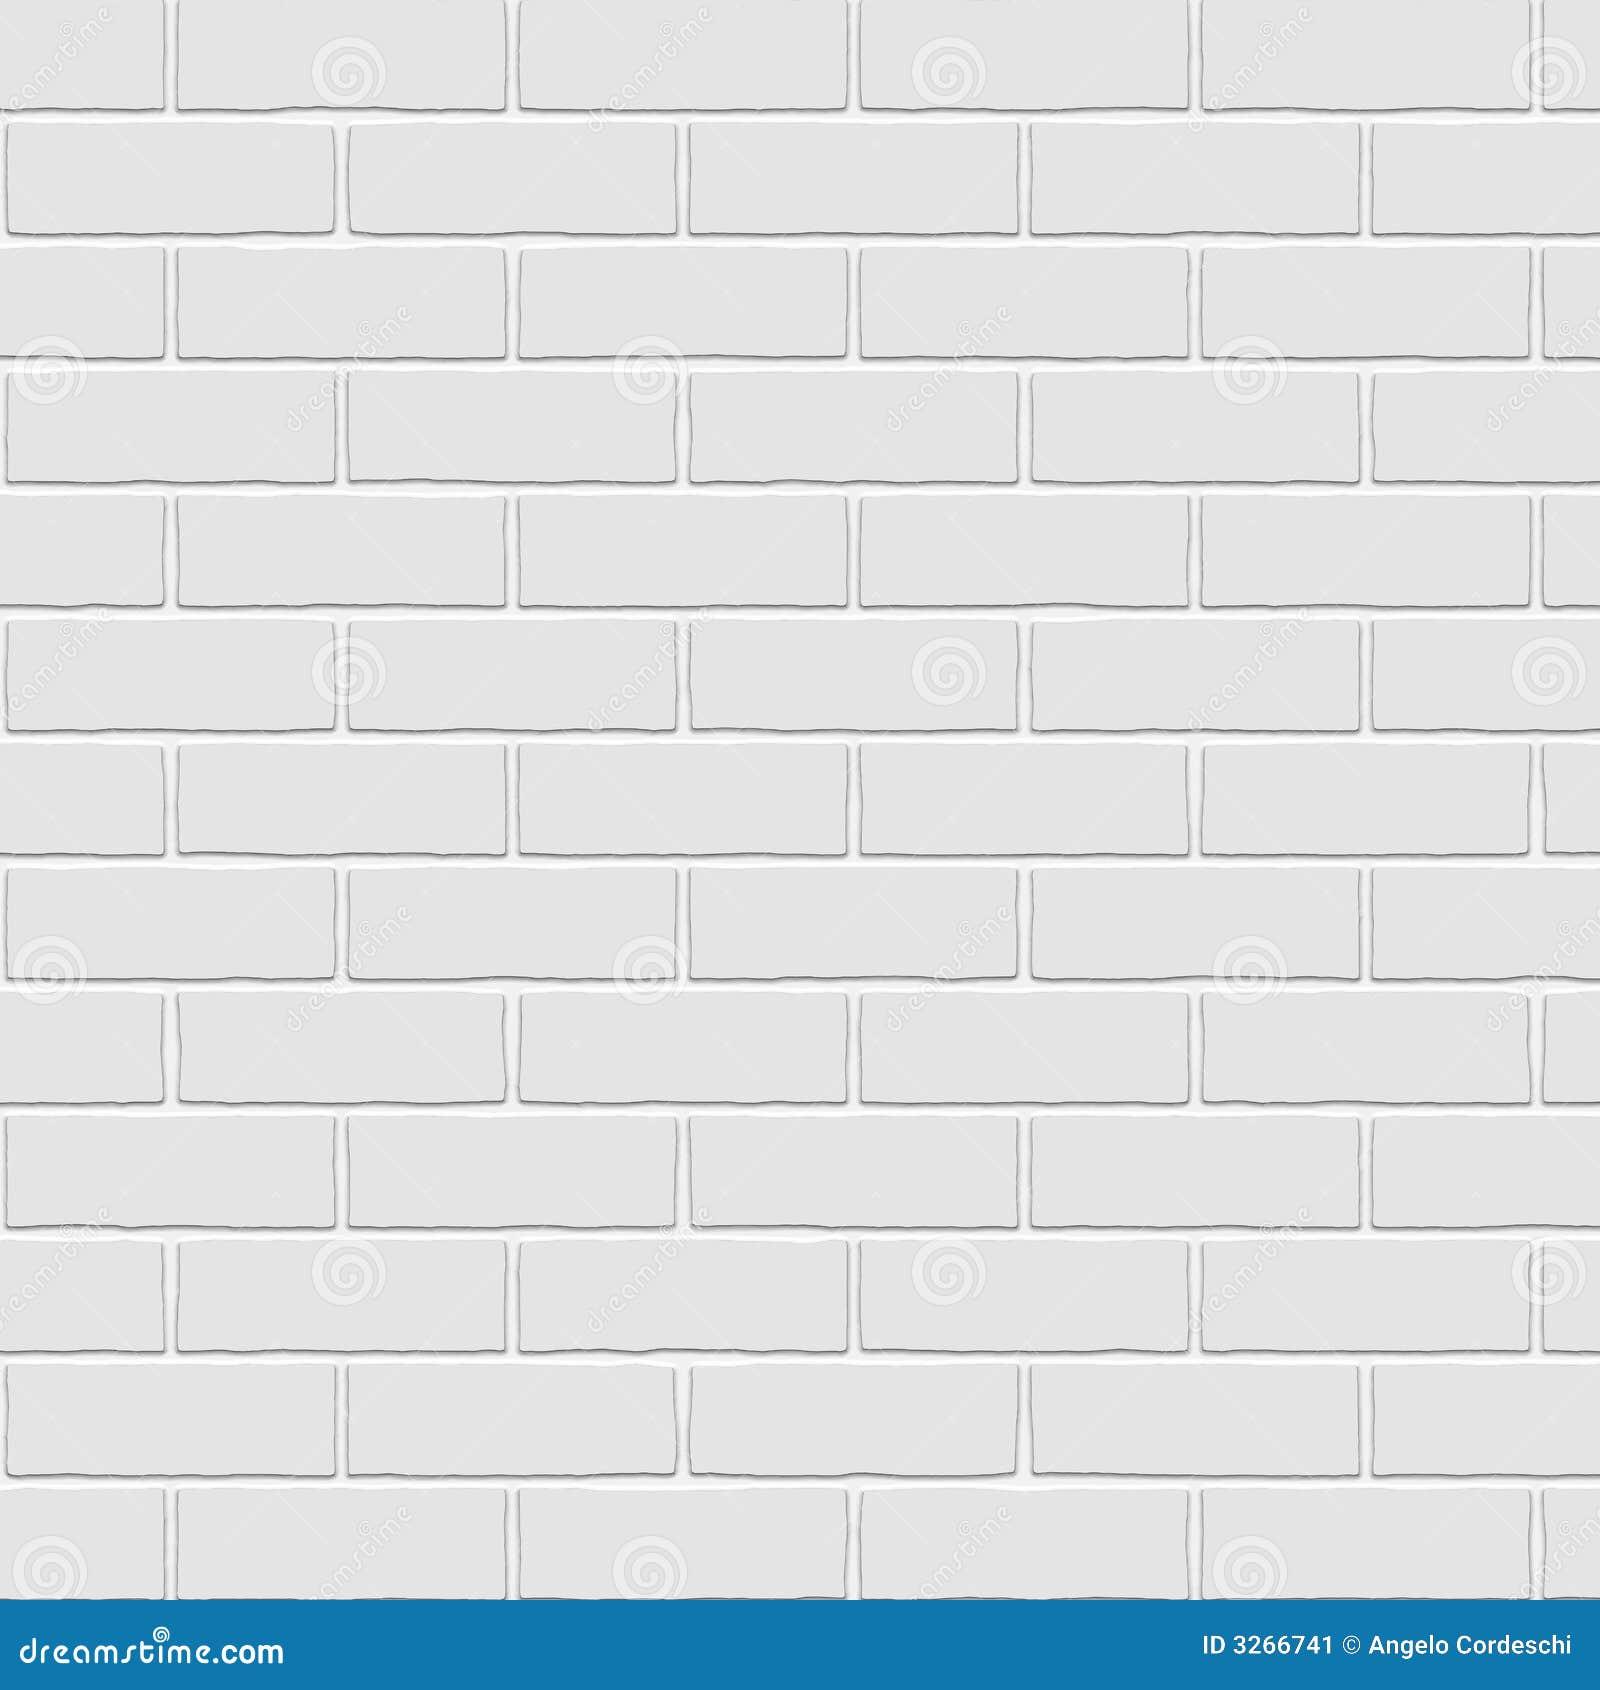 Painted Brick Wall Stock Image Image 3266741